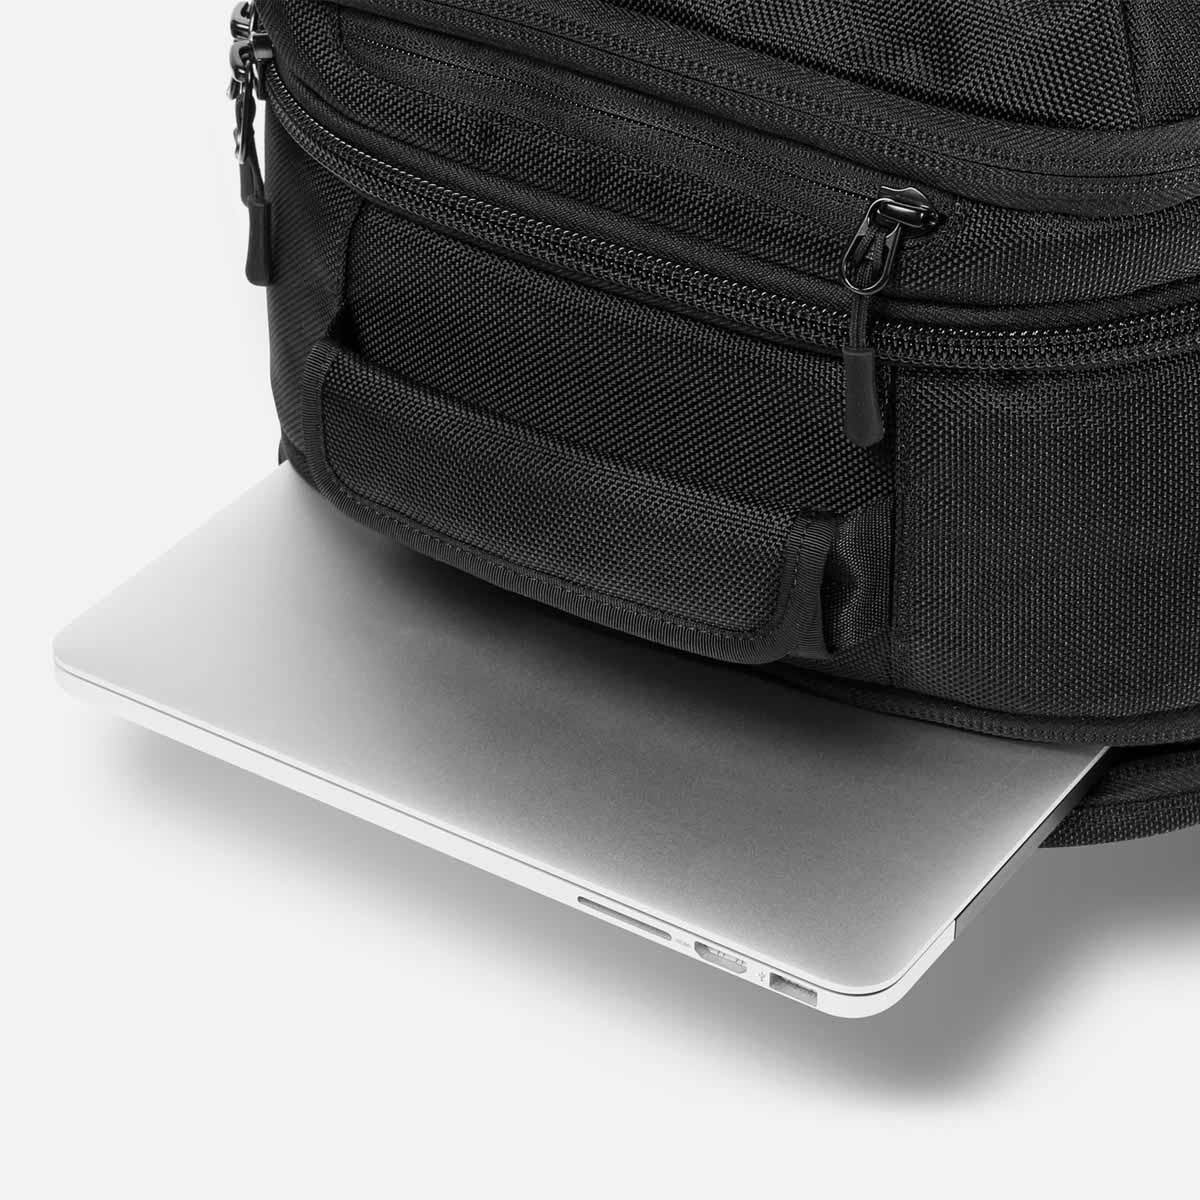 21003_tp_black_laptop.JPG